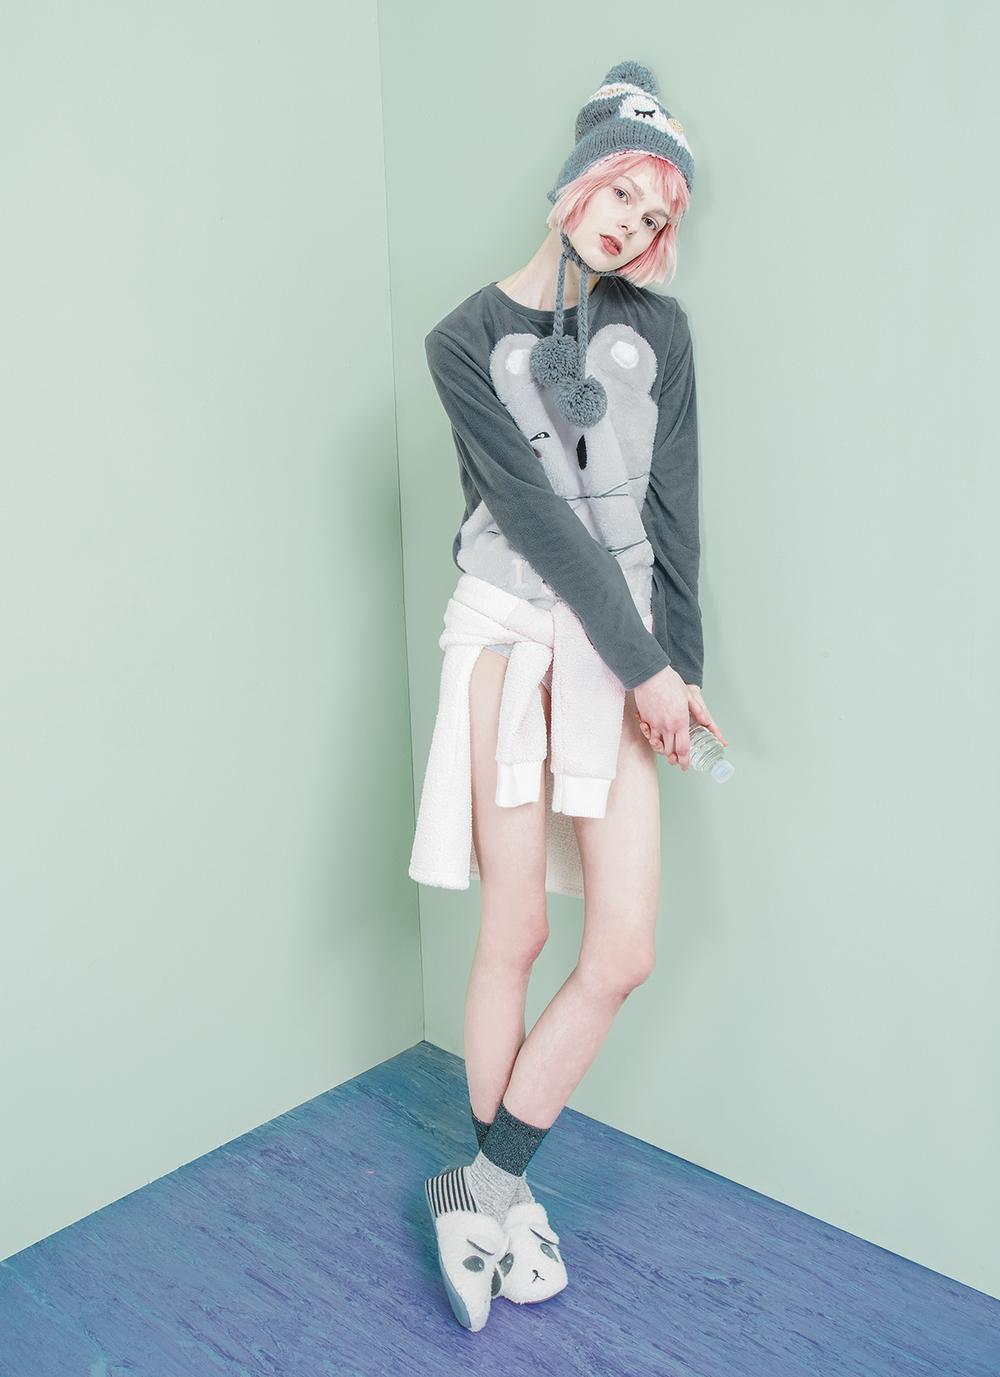 Lookbook sleepwear Oysho by Ernesto Artillo  (12).jpg